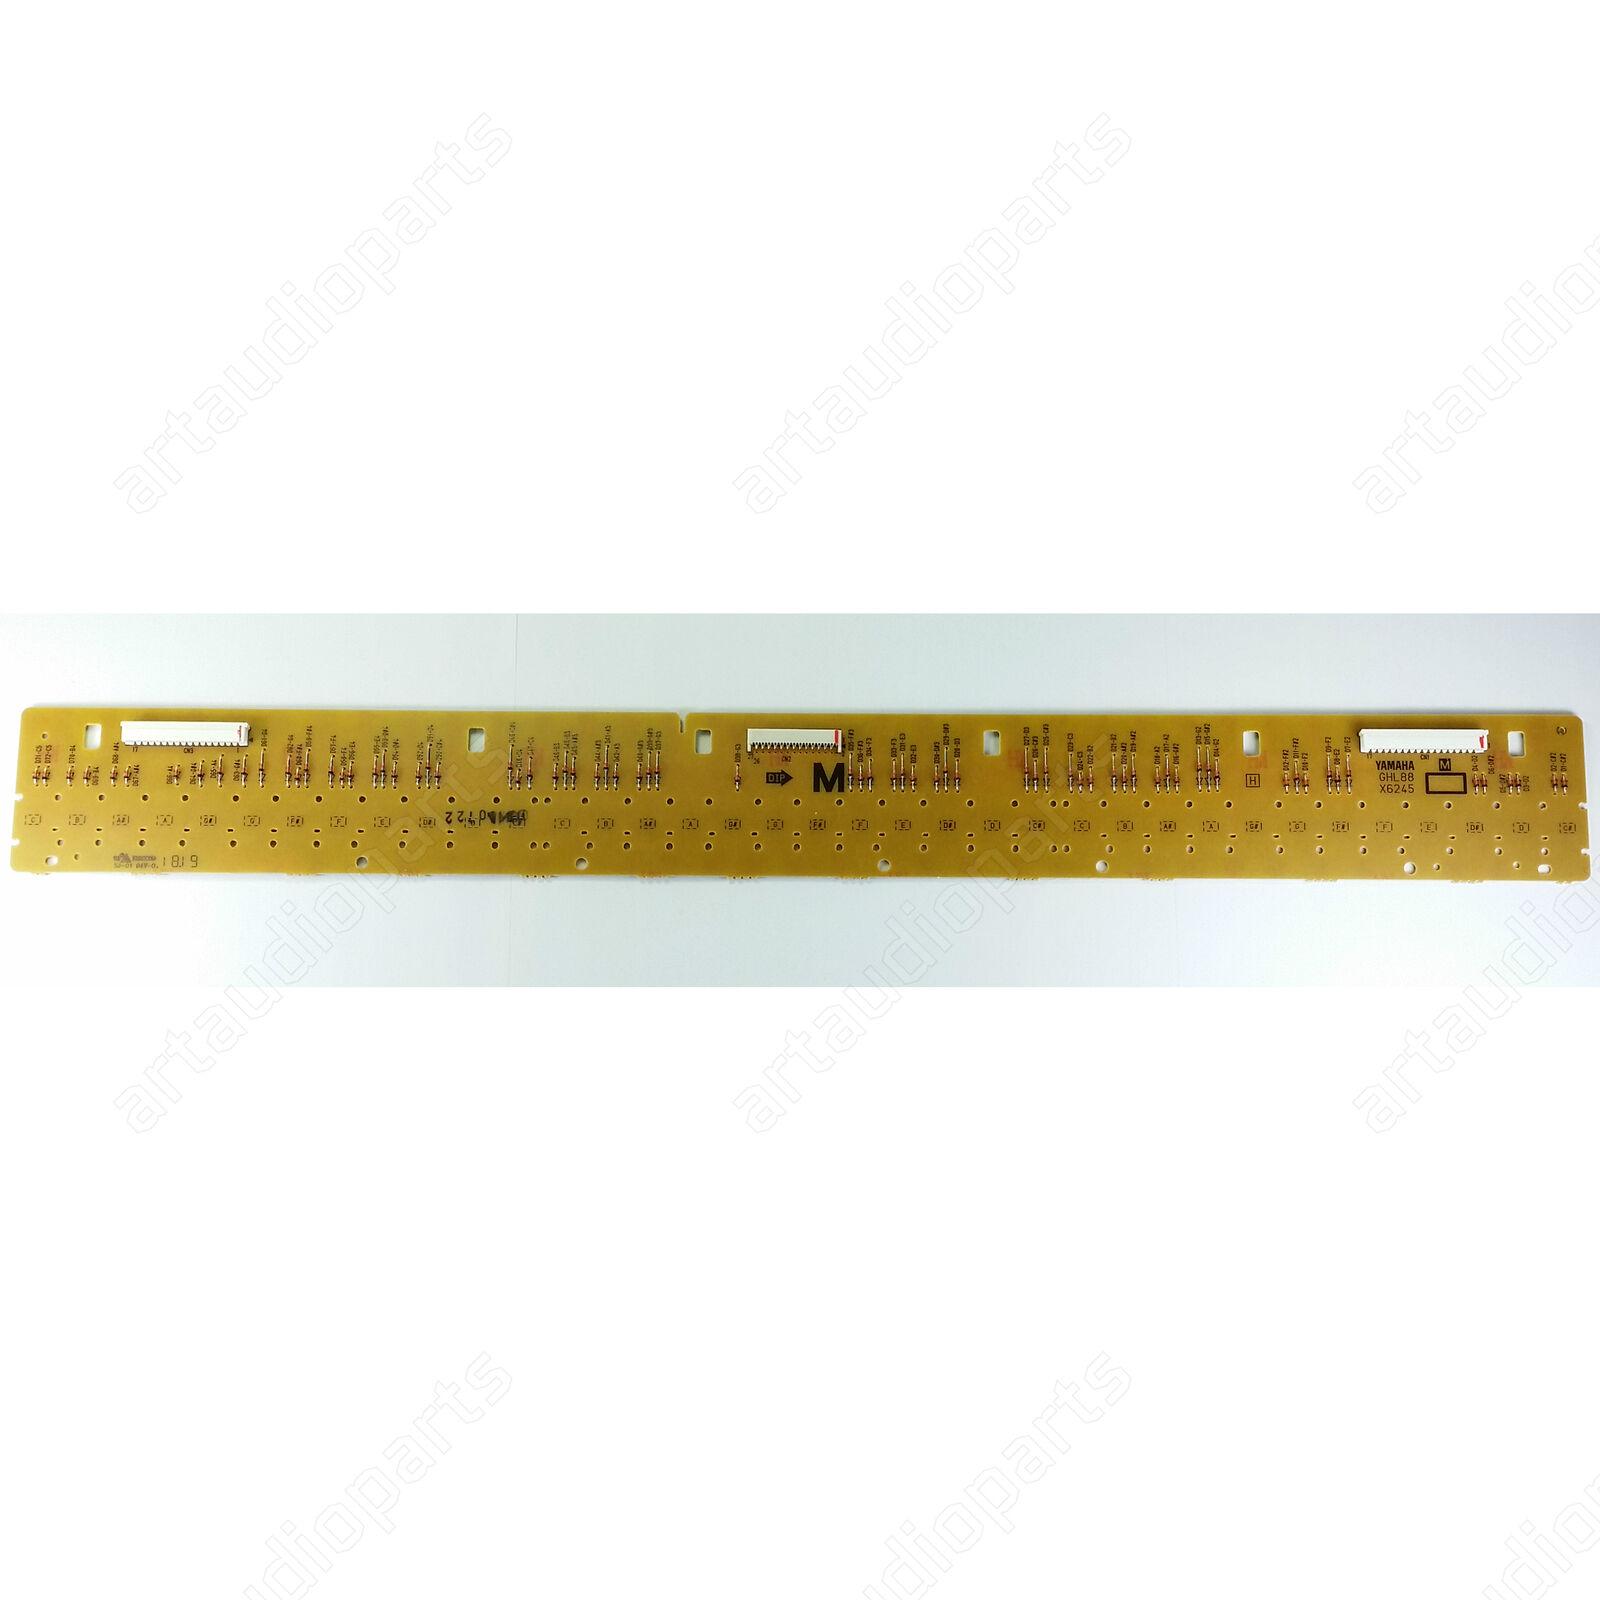 Keys circuit board GHL88M for Yamaha DGX-620 DGX-630 DGX-640 DGX-650 DGX-660 KBP